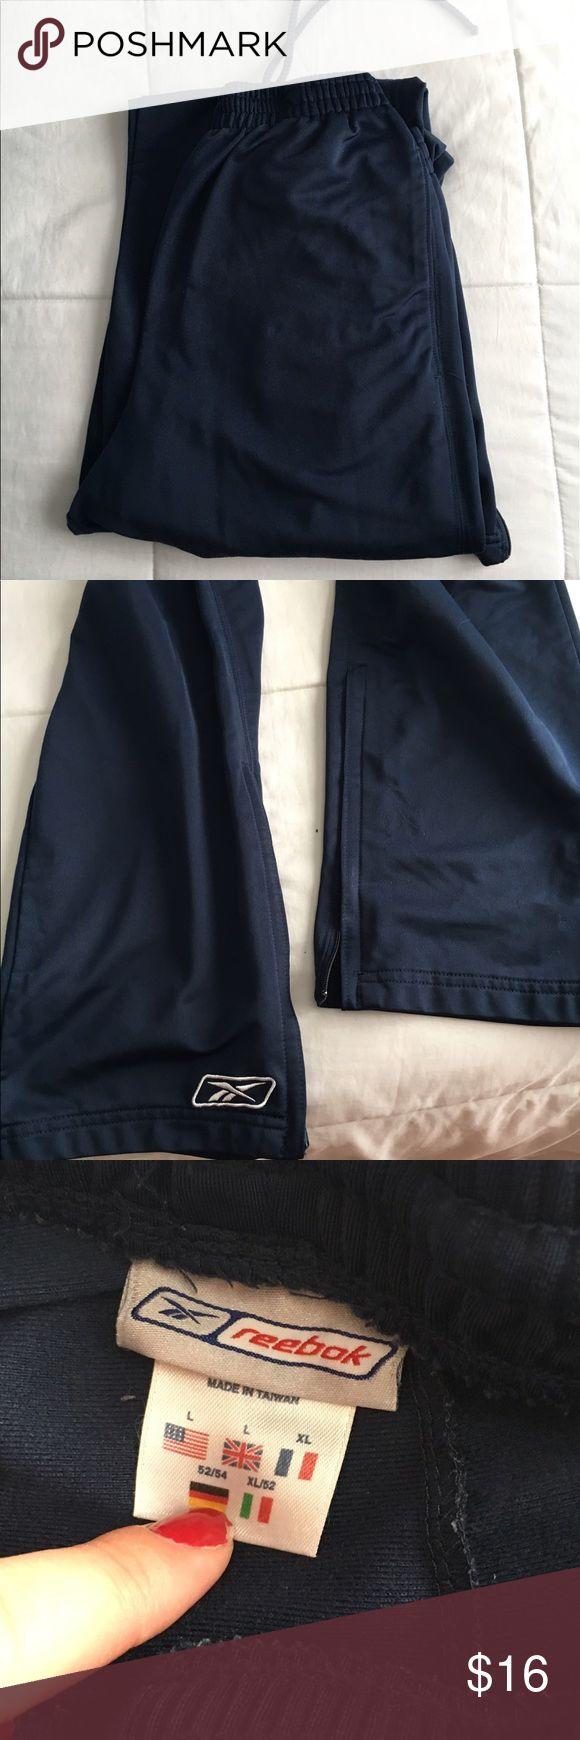 Men's Reebok sweatpants In perfect condition! Zips up ankle Reebok Pants